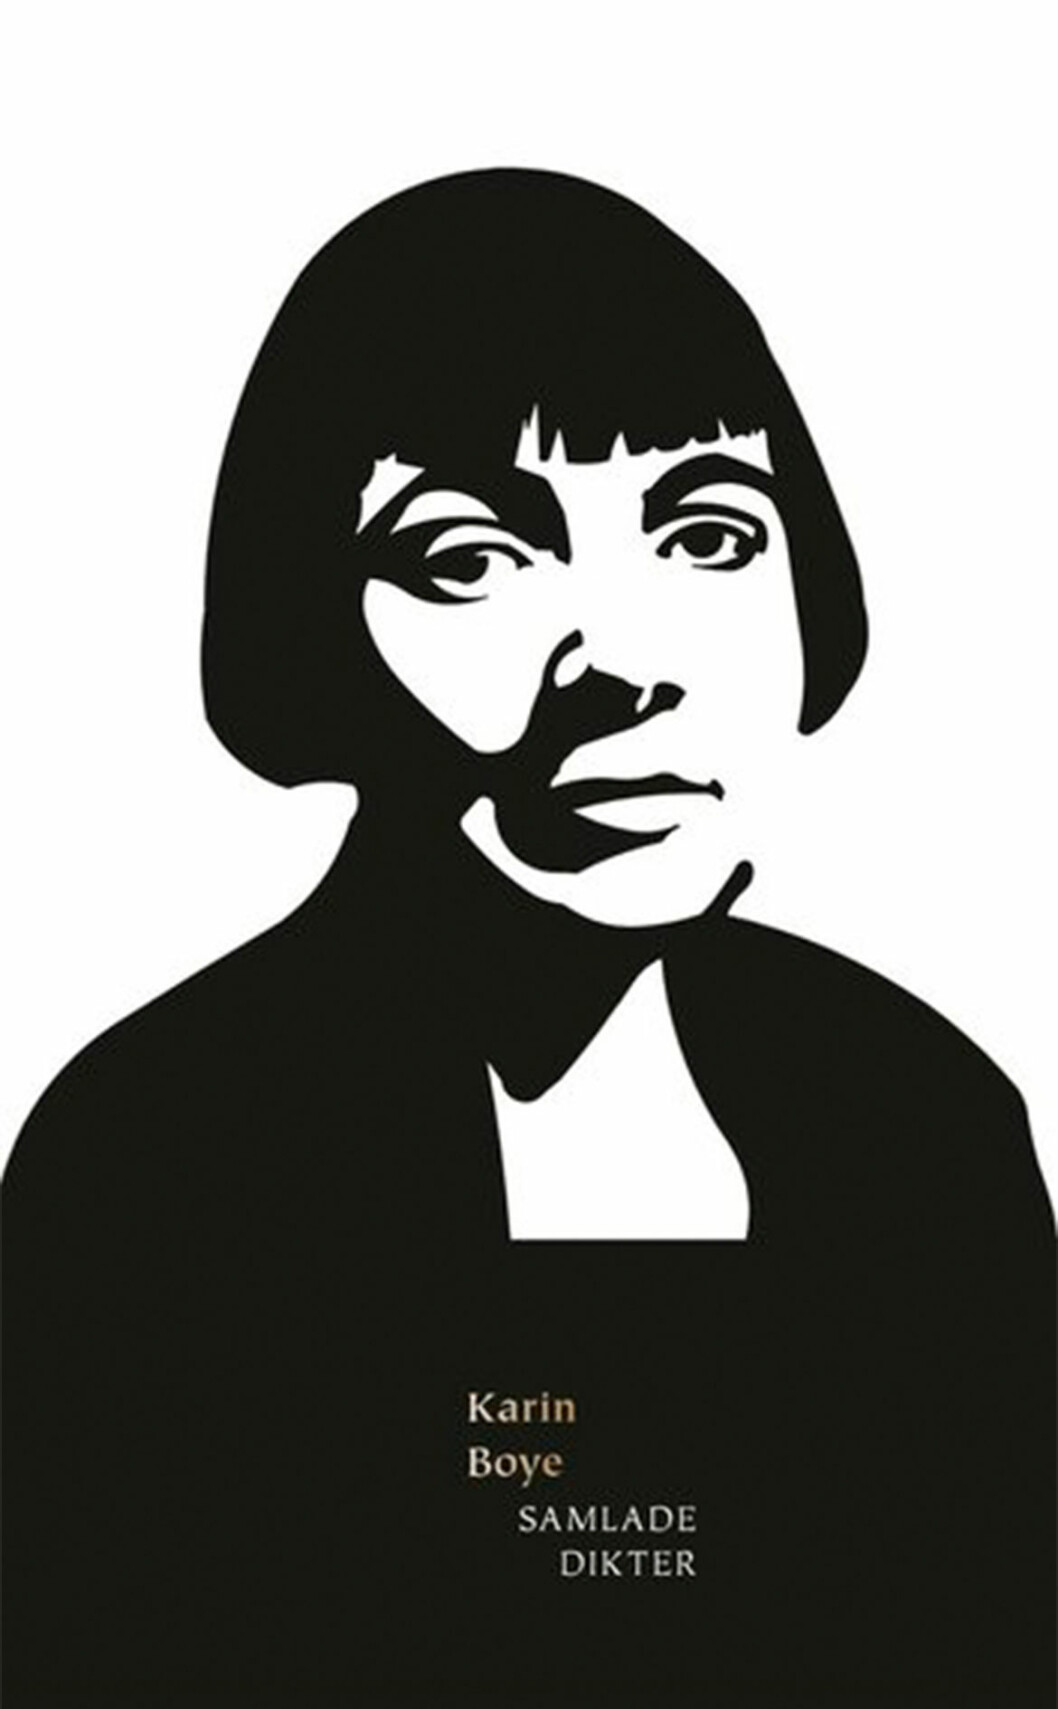 Bokomslag till Karin Boye samlade dikter, Illustration av Karin Boye.